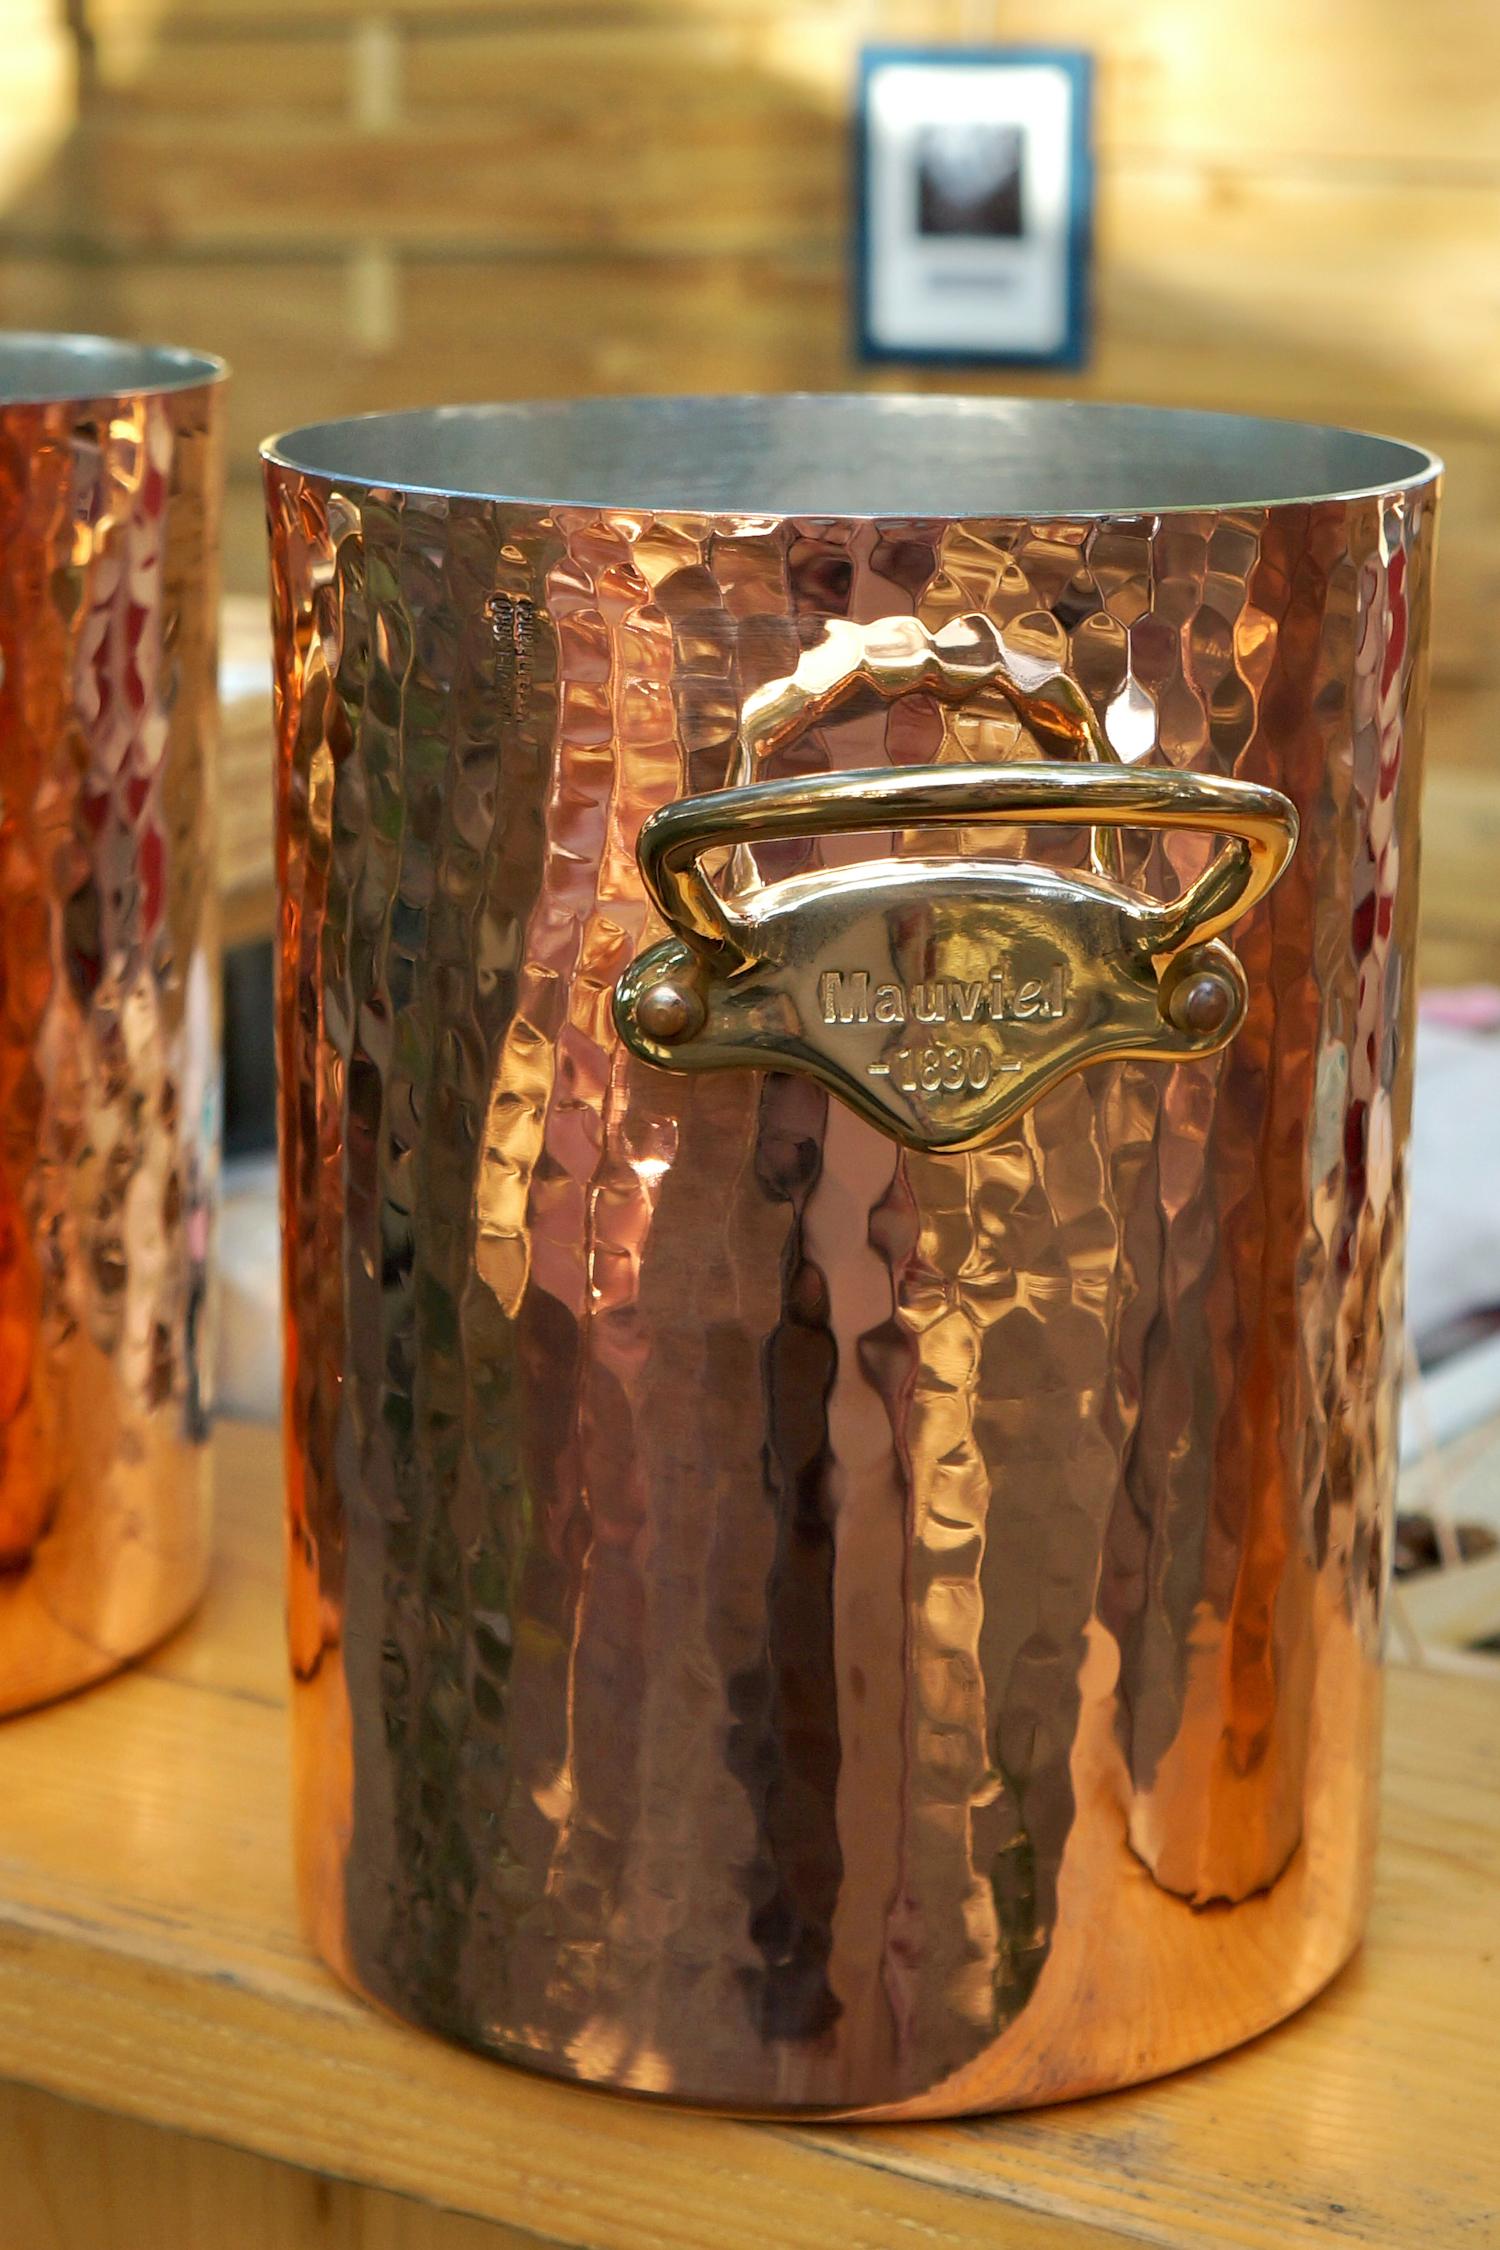 Mauviel 1830 copper ice bucket